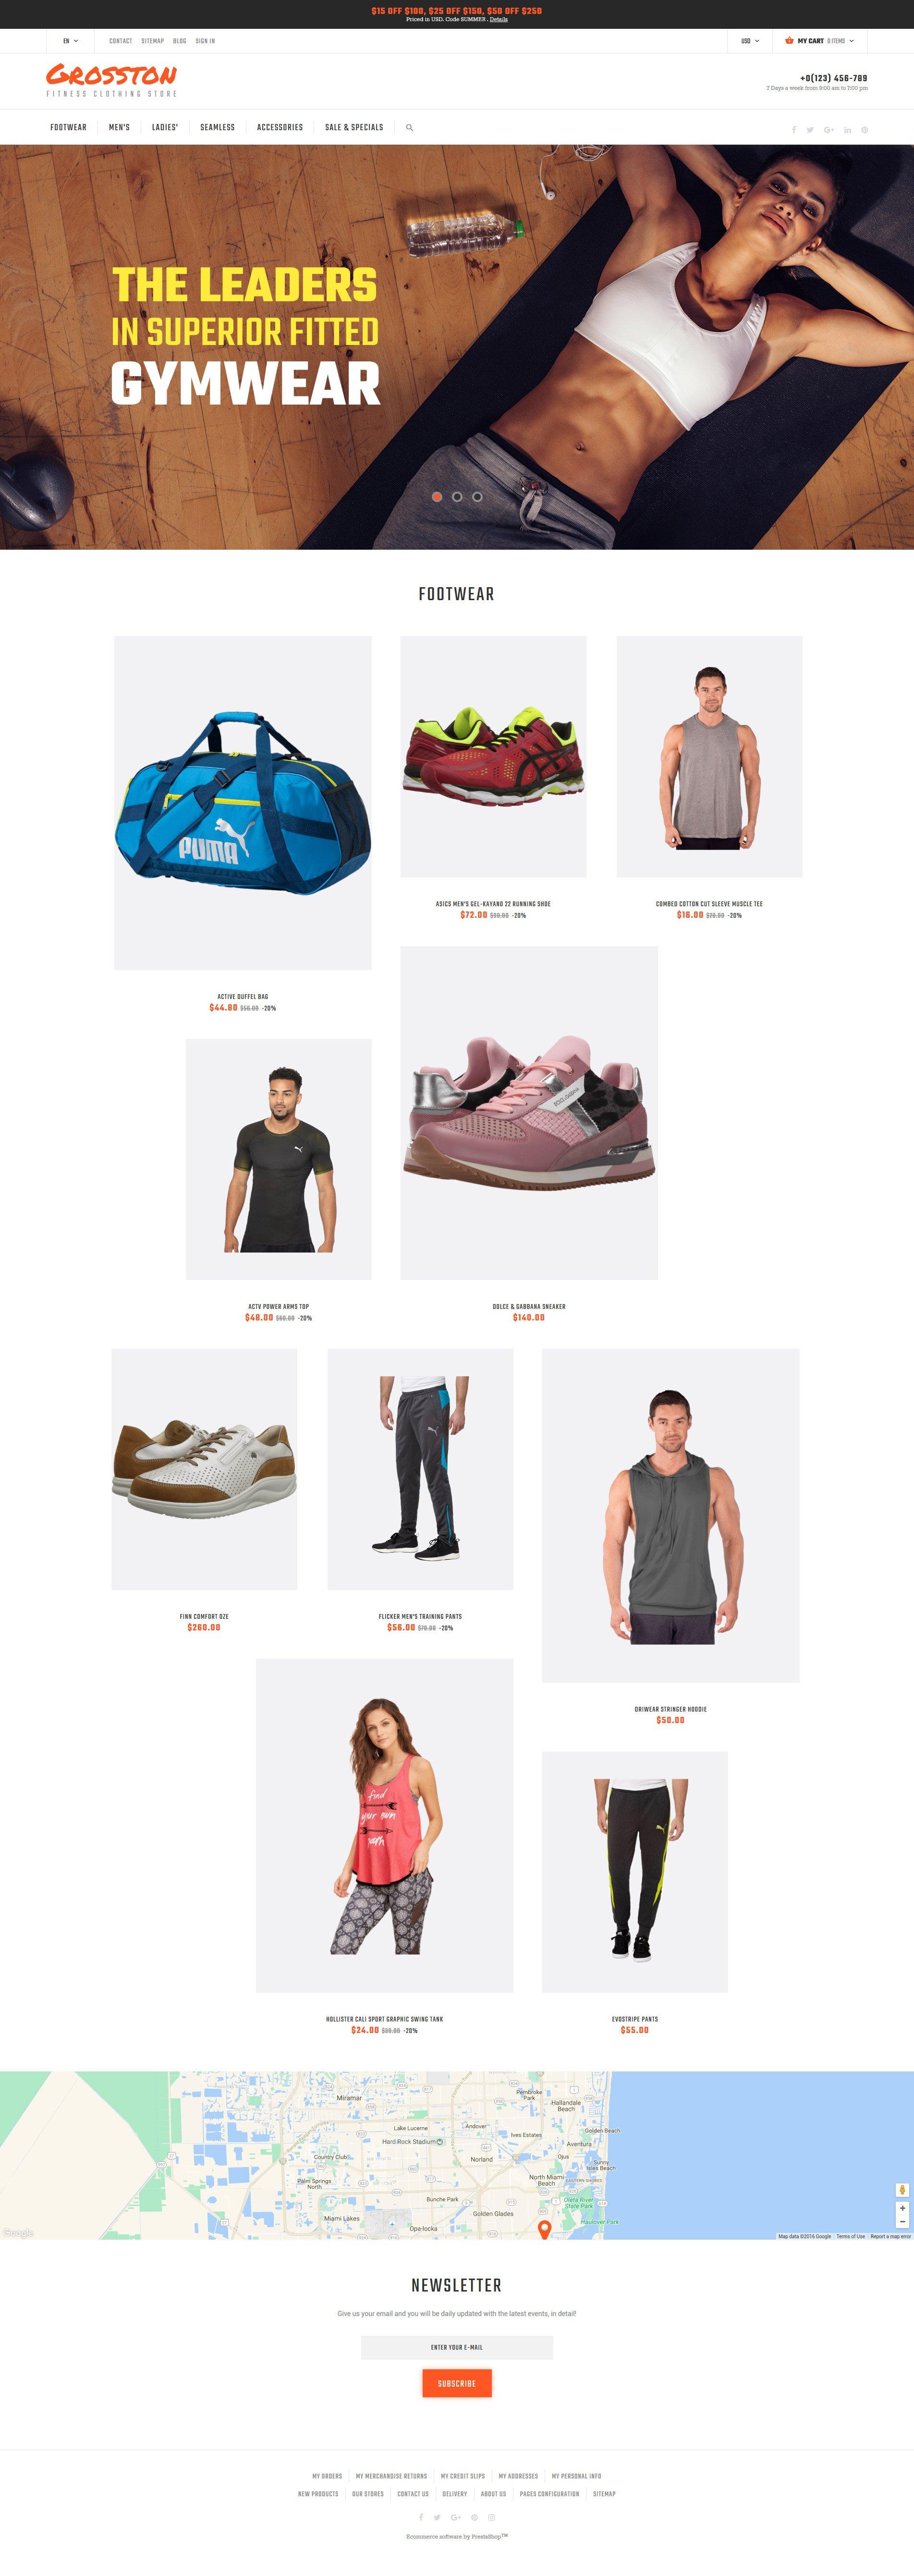 Crosston - Fitness Clothing Store PrestaShop Theme - screenshot